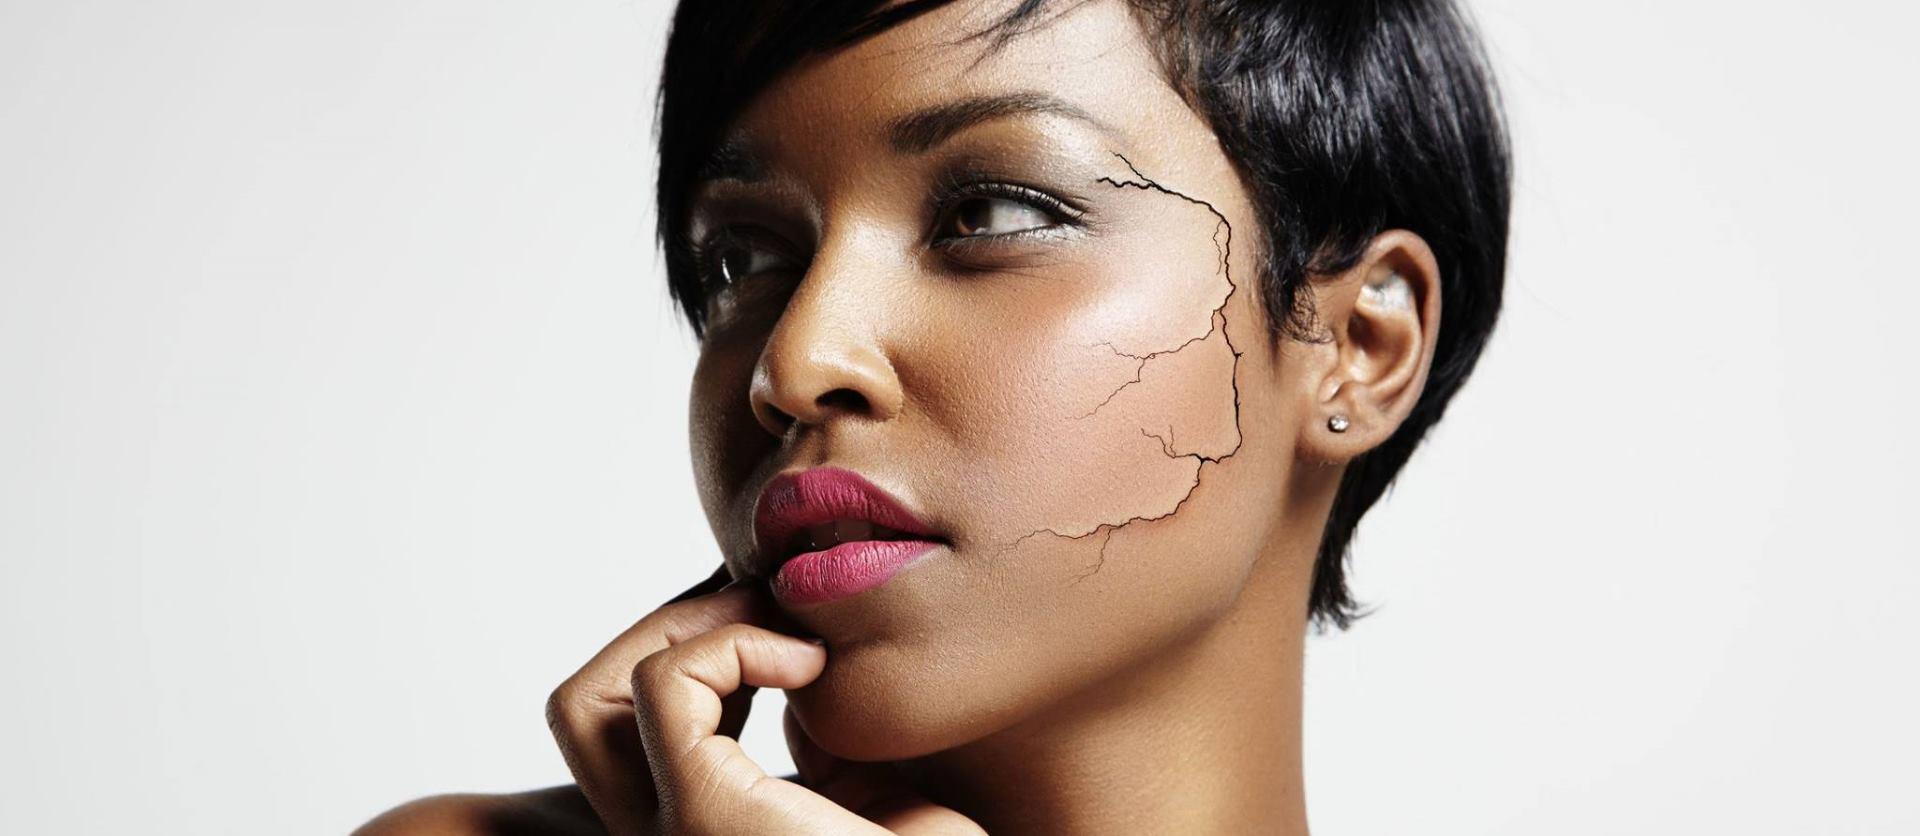 VIDEO: Čuvajte kožu lica tokom zime